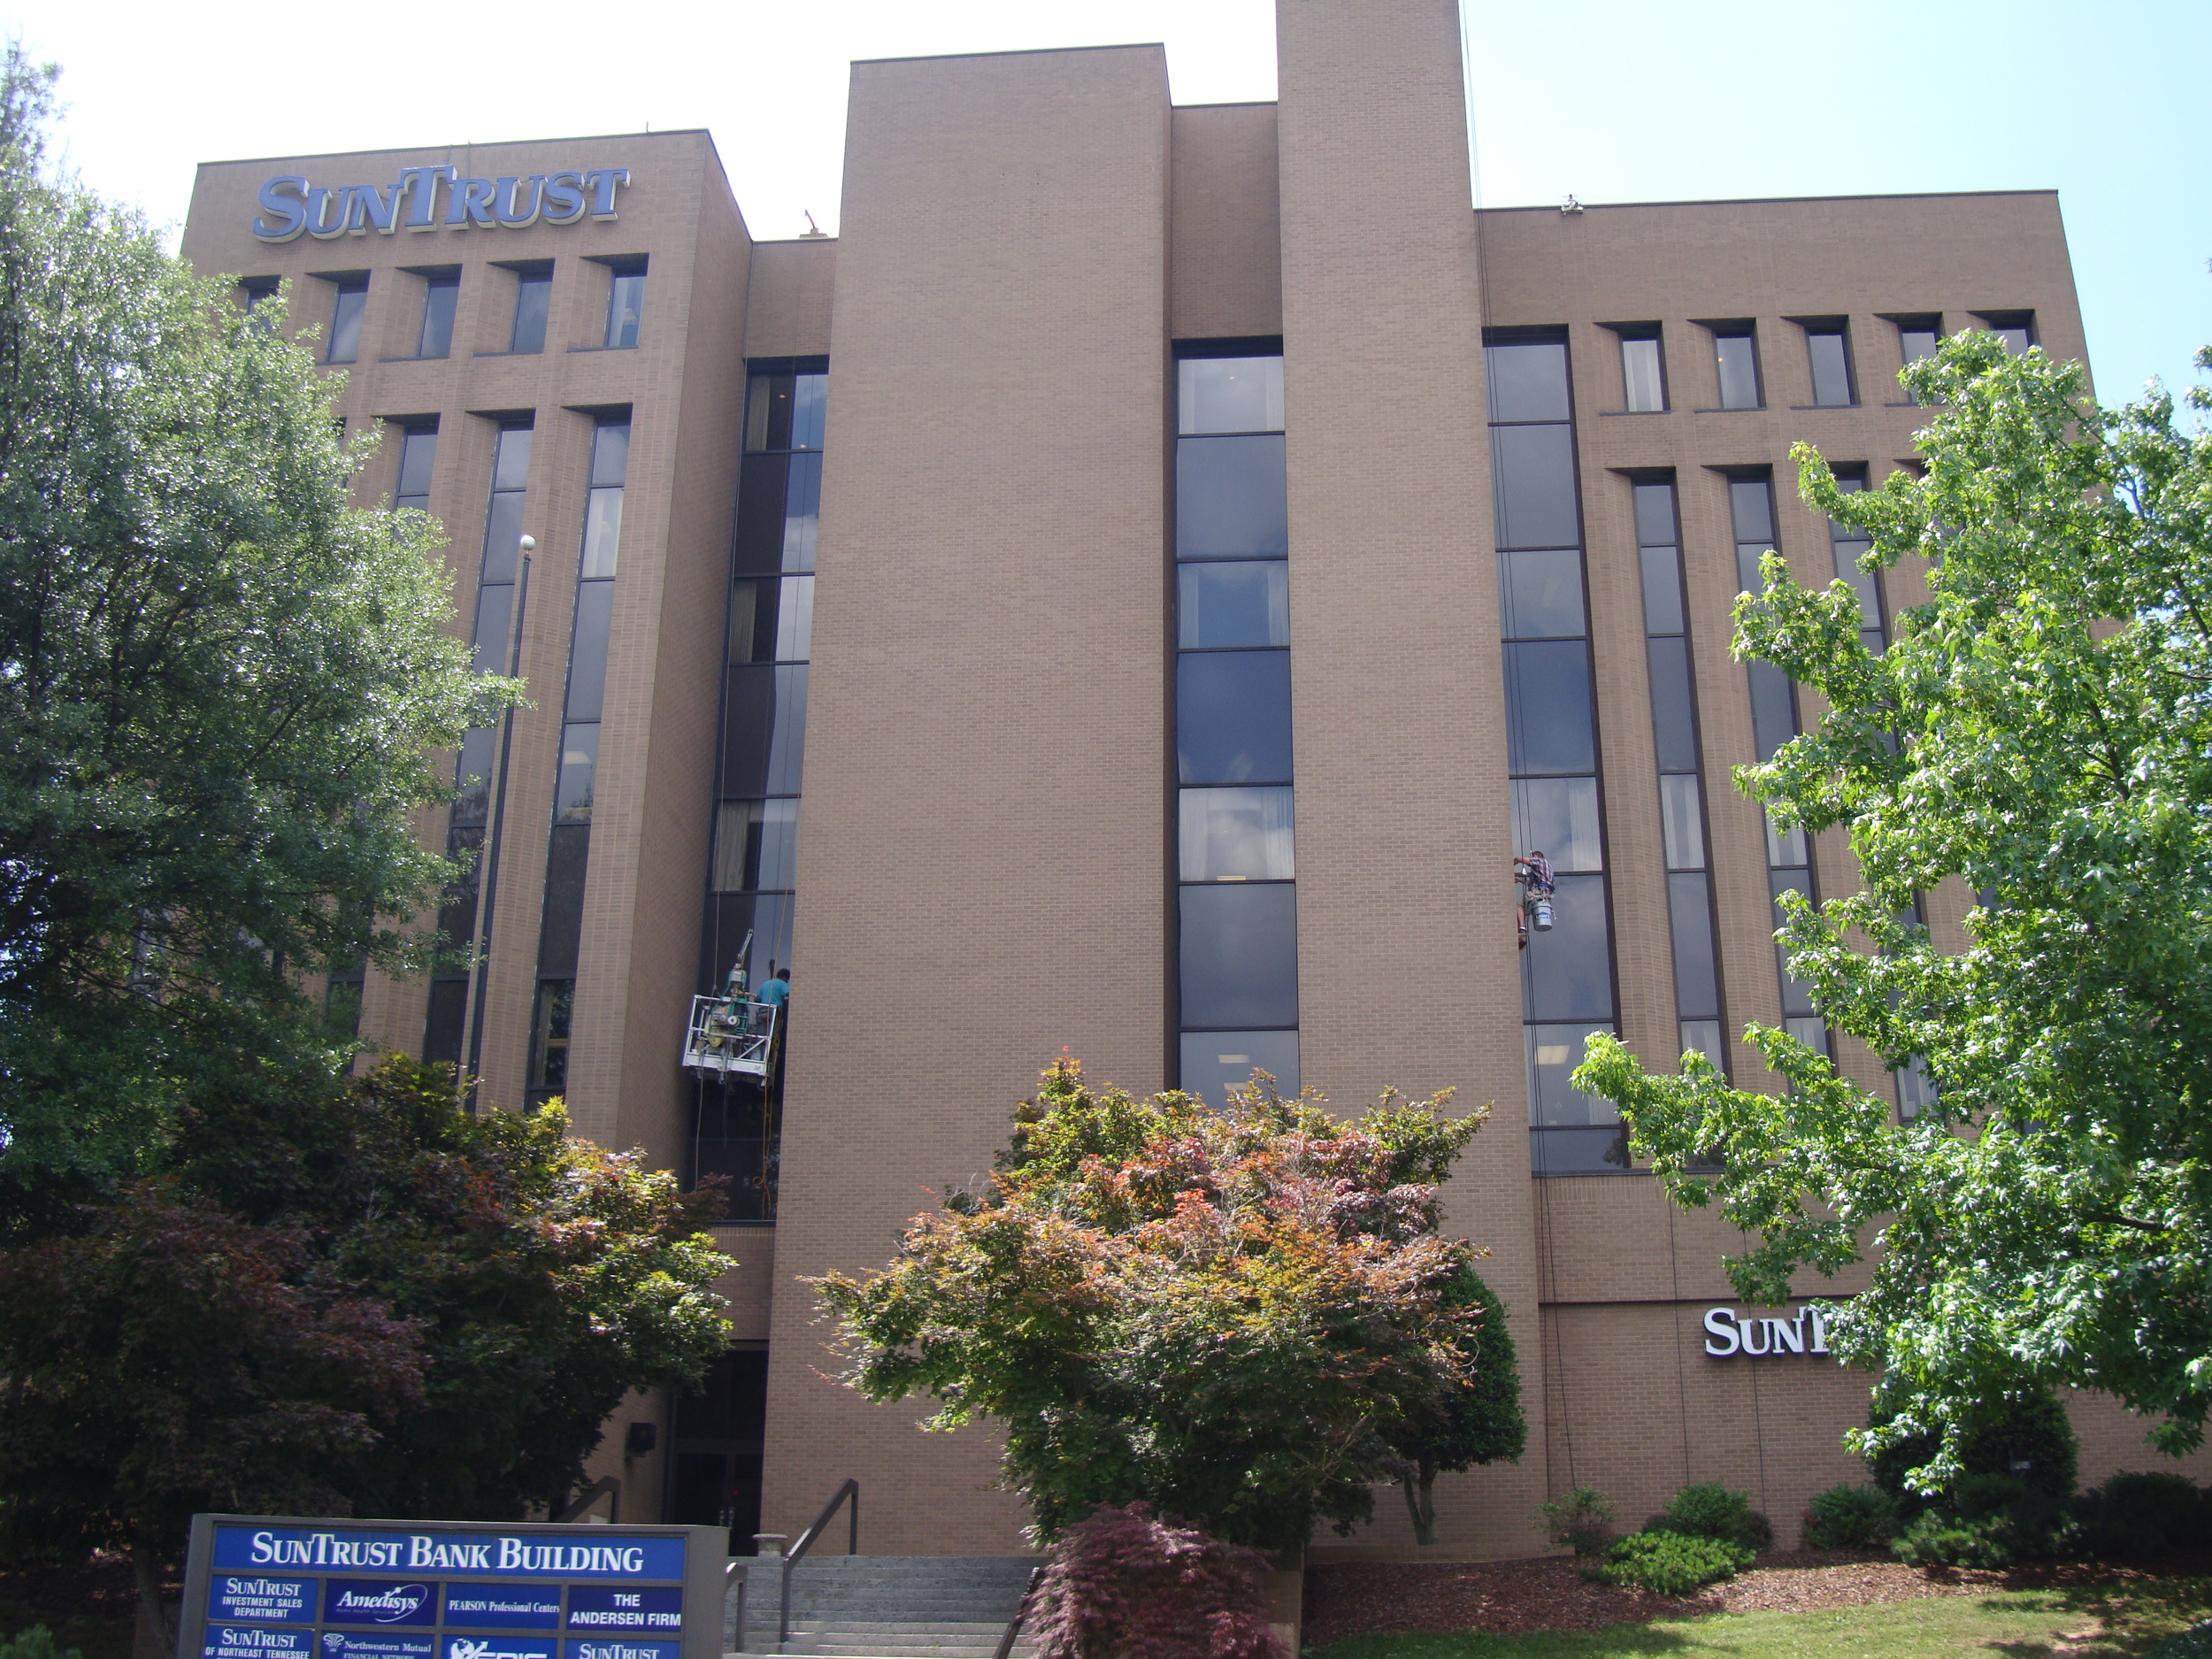 Suntrust Bank - Johnson City, TN - Built in 1979 - 5 Stories - Modernism Style - Commercial Office Use